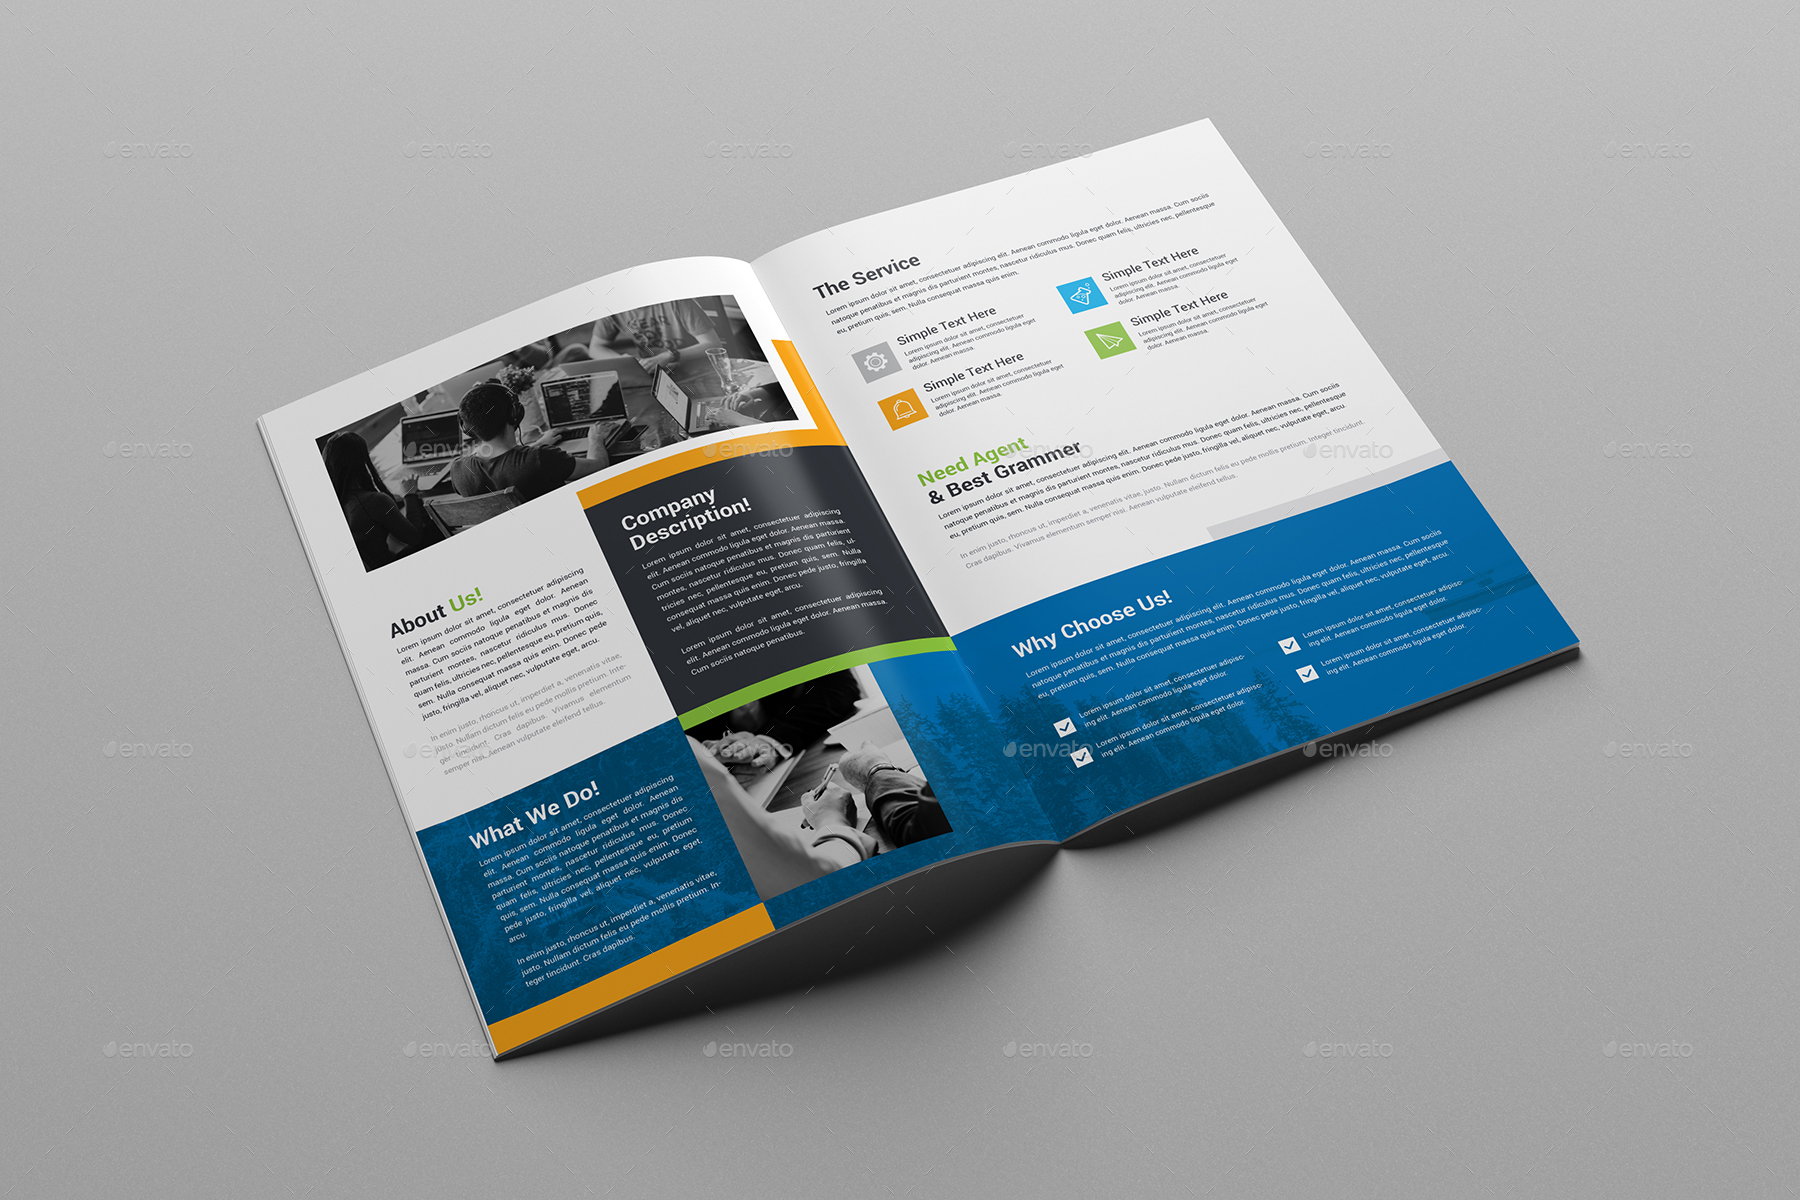 Bi fold brochure template by generousart graphicriver bi fold brochure template corporate brochures preview image set01bifold brochureimageg saigontimesfo